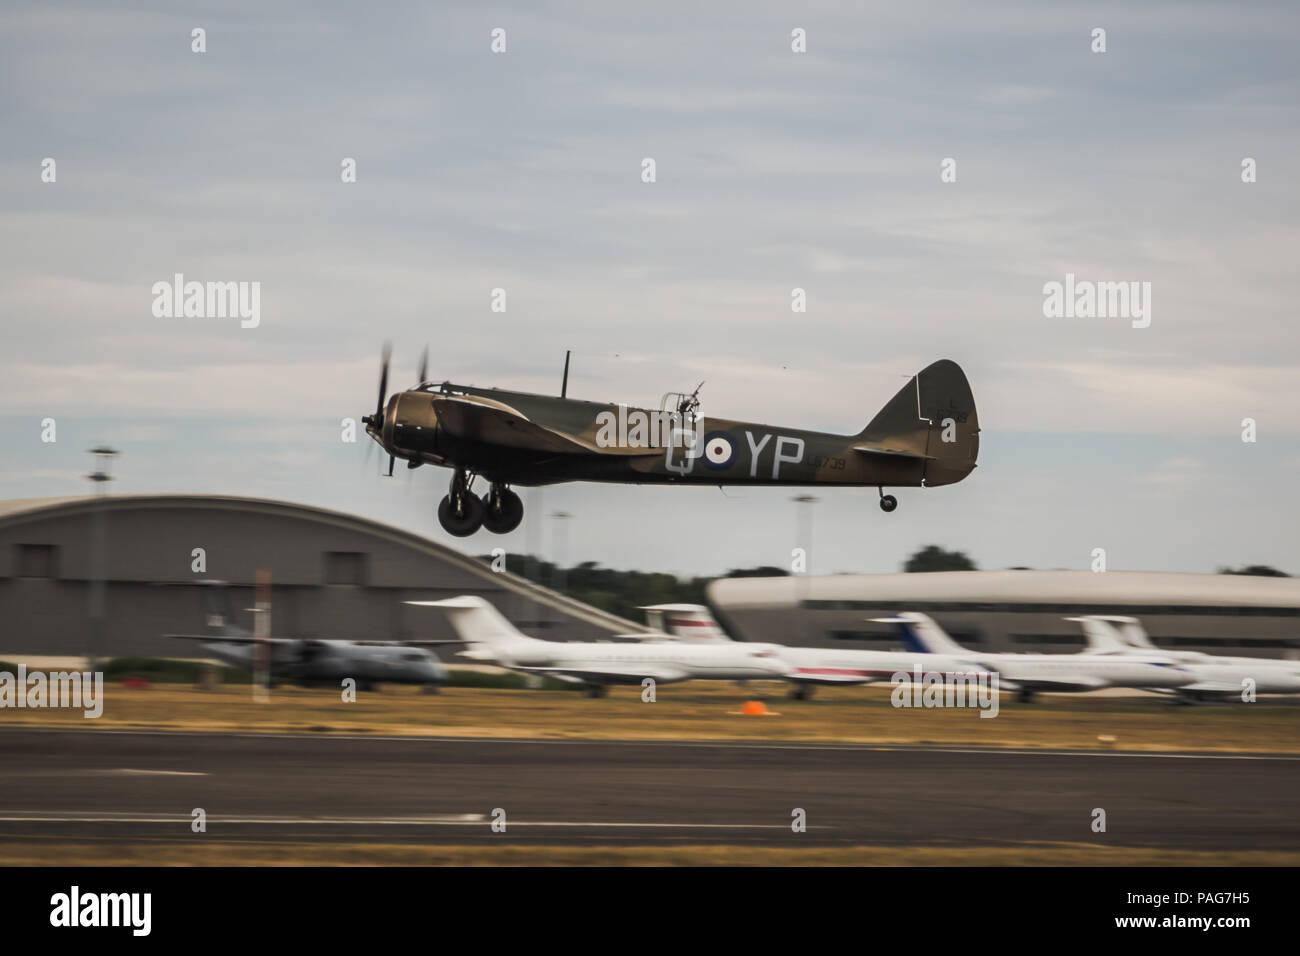 The Bristol Aeroplane company Bristol Blenheim display in Farnborough international Airshow 2018. - Stock Image